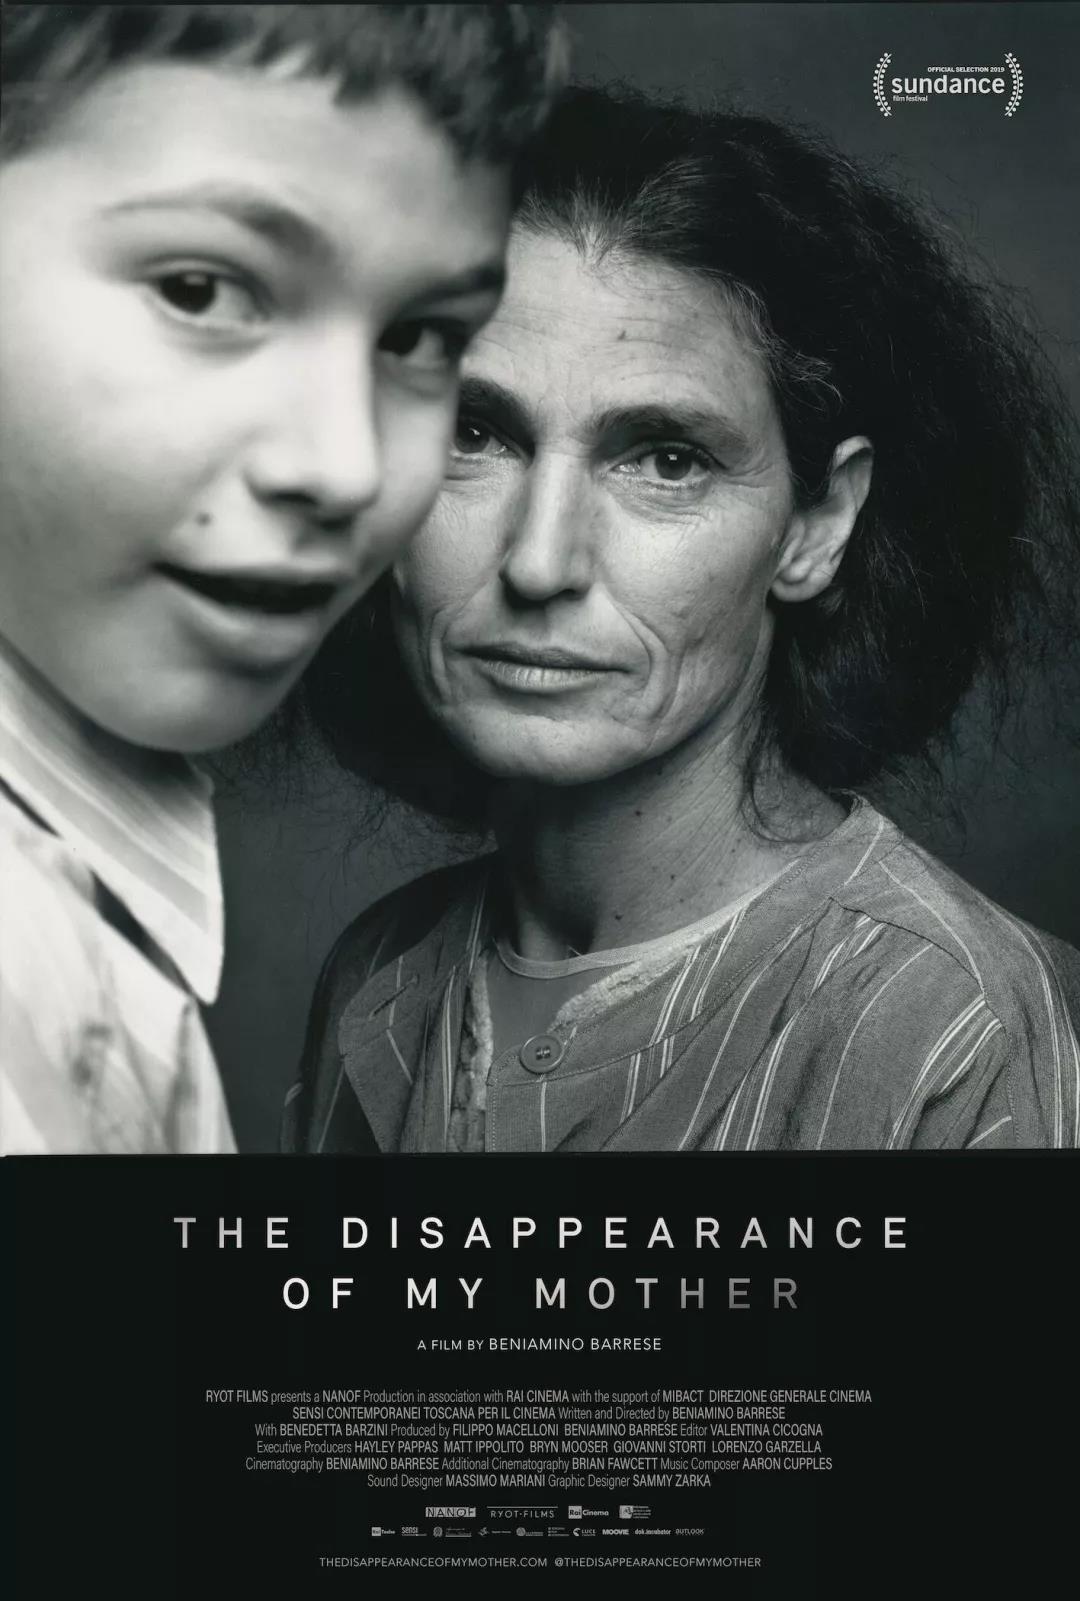 《我母亲的消失》 THE DISAPPEARANCE OF MY MOTHER 导演:Beniamino Barrese 制片国家/地区:意大利 / 美国 片长:95分钟 制片商:Nanof Productions